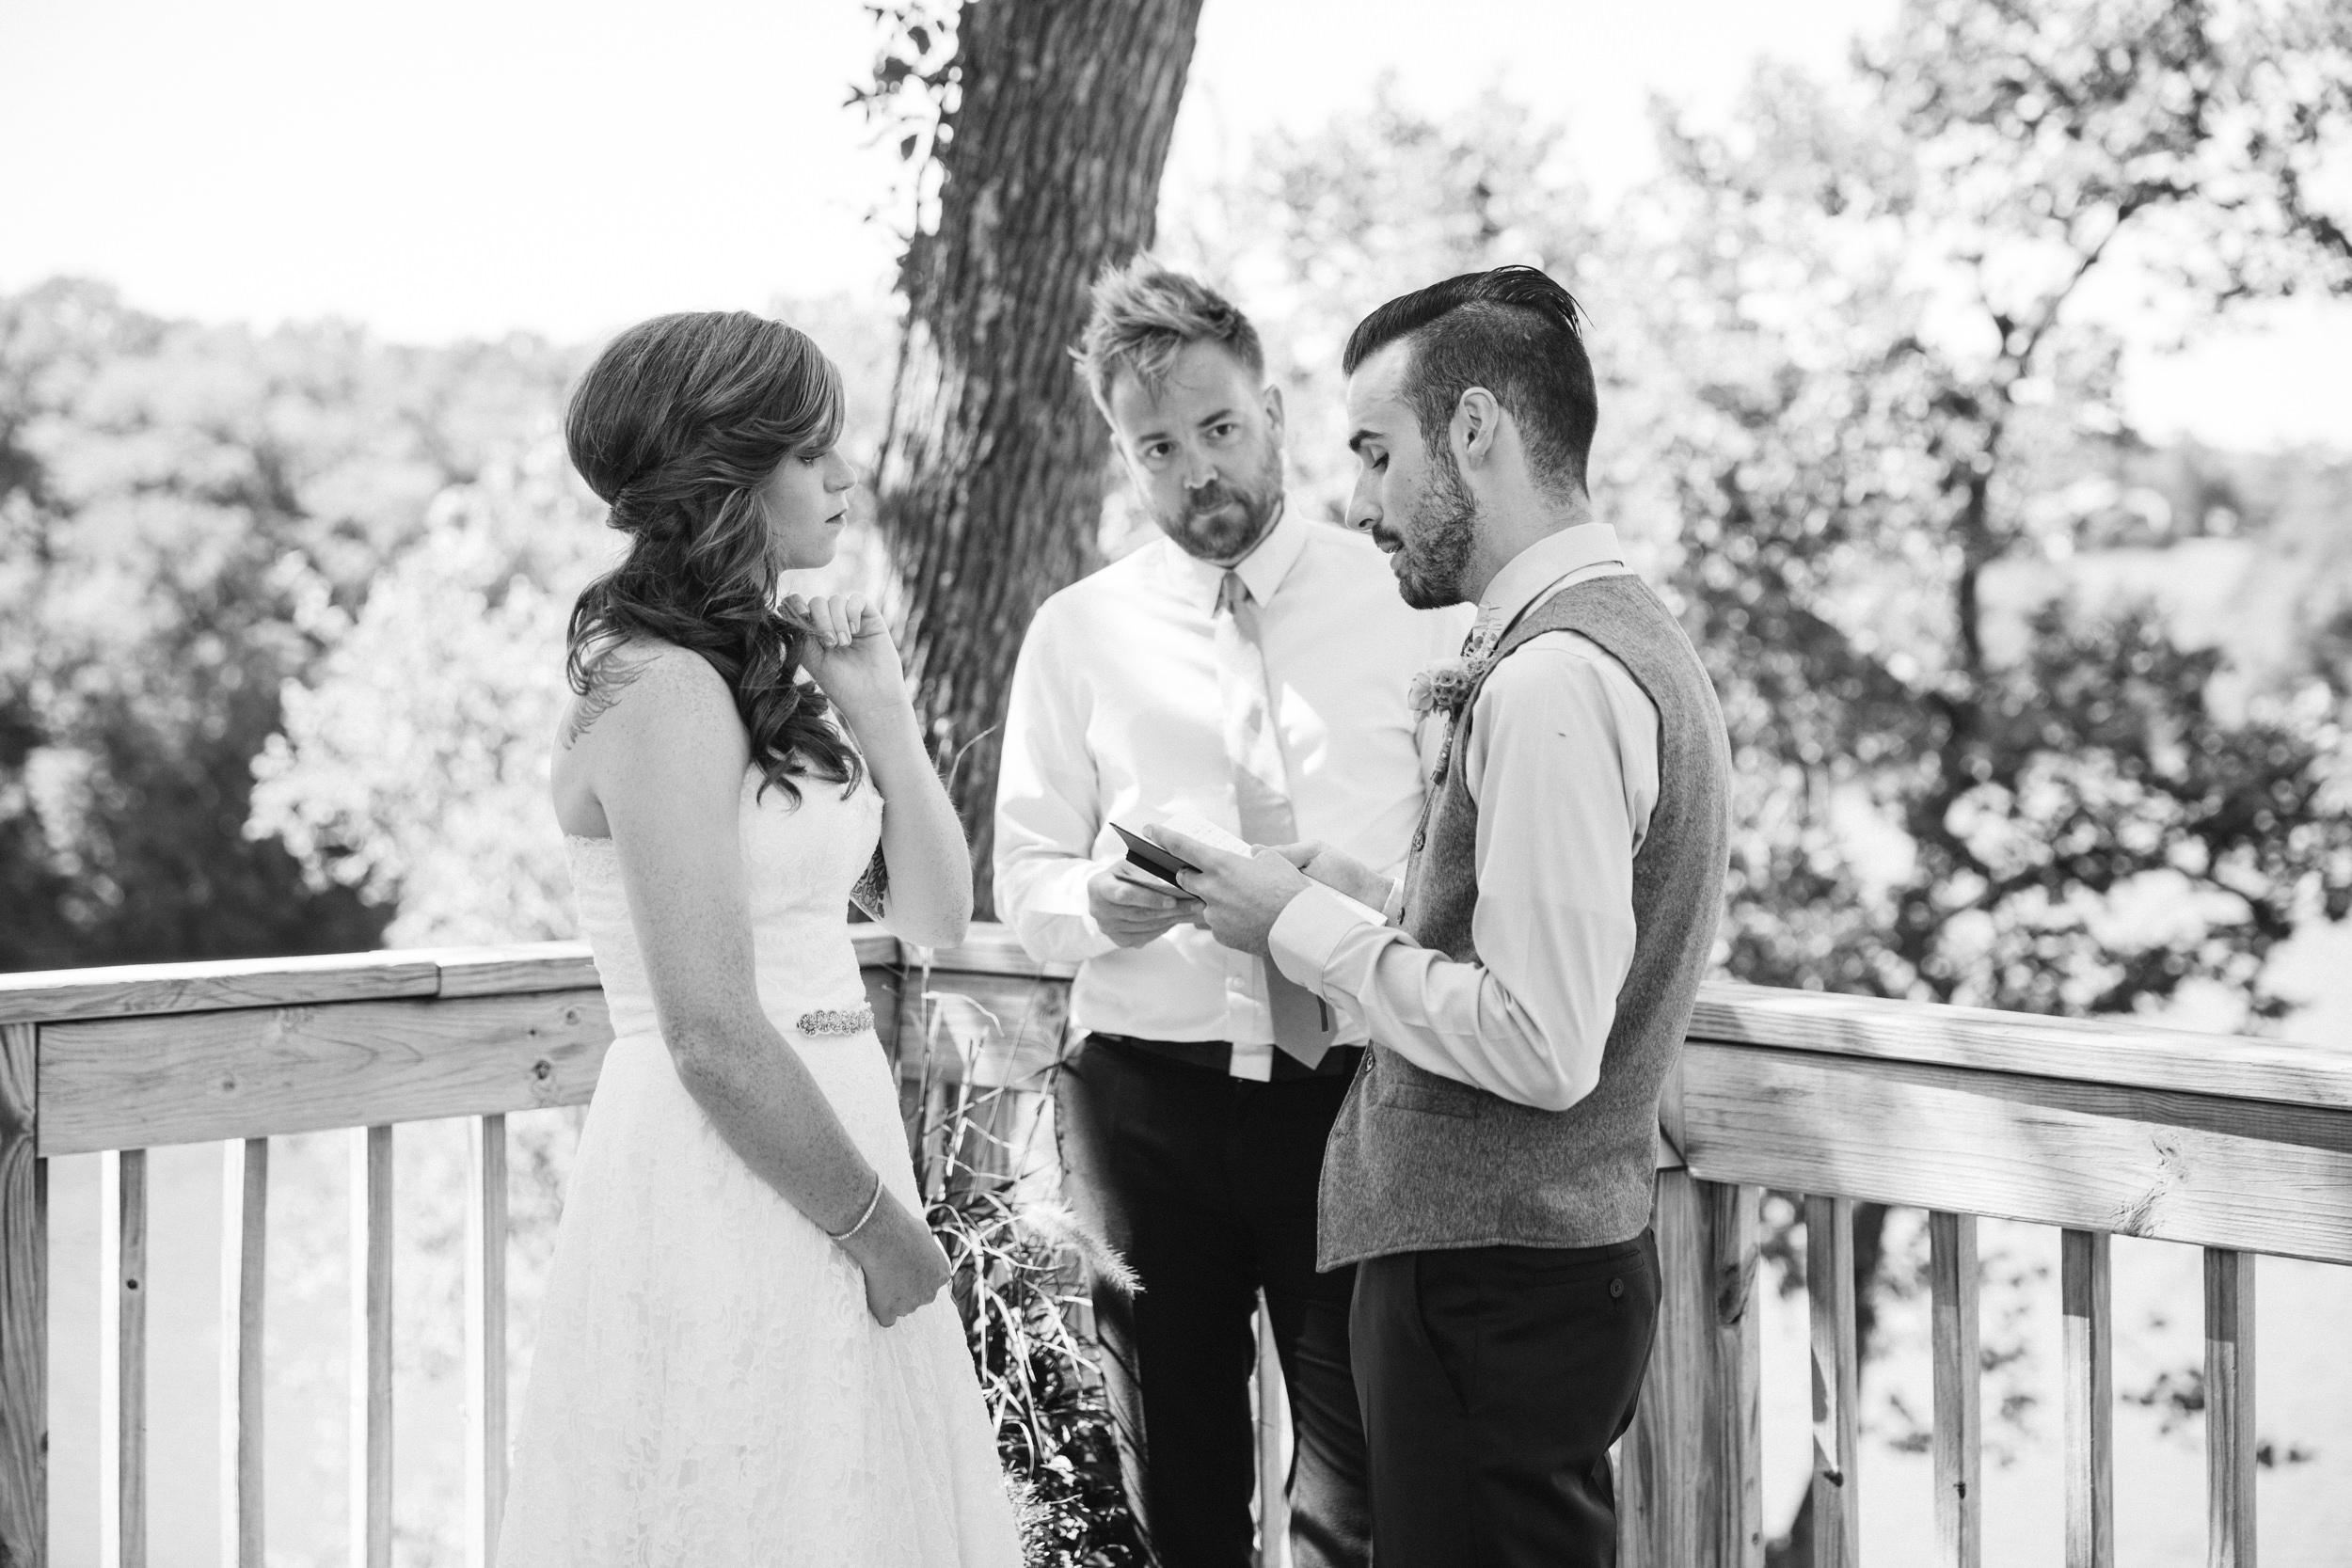 7-25-2015 Sarah and Jimmy's Eagle Ridge Downtown Galena Wedding-144.jpg